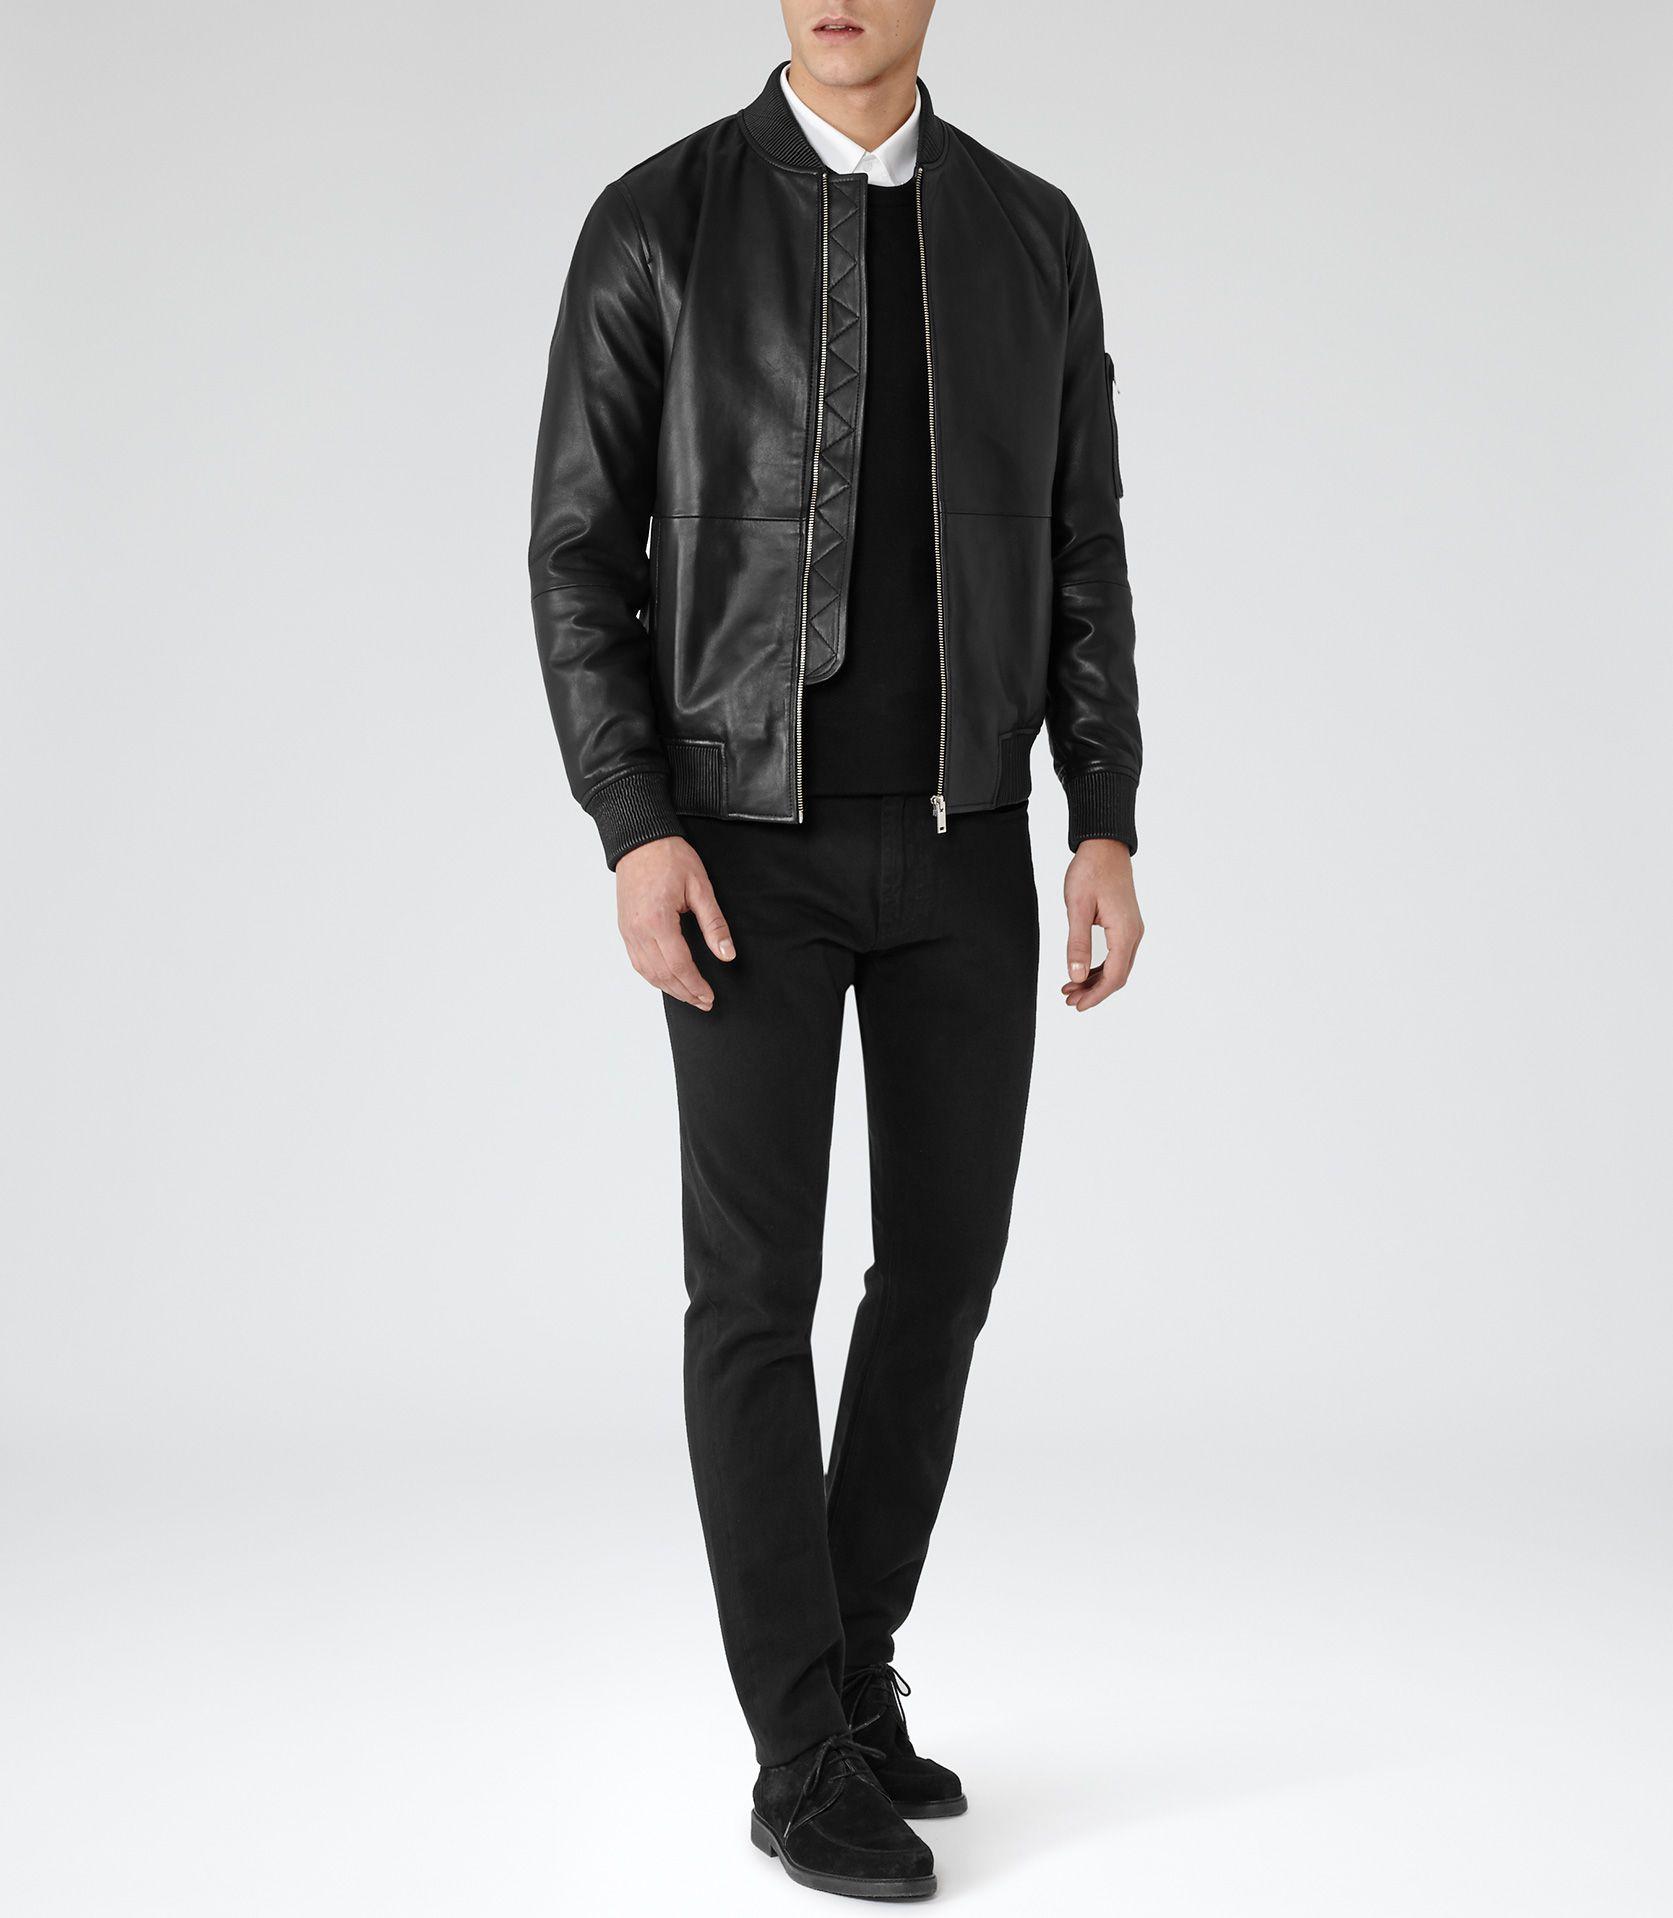 Bardot Black Leather Bomber Jacket Black Leather Bomber Jacket Mens Clothing Styles Leather Bomber Jacket [ 1918 x 1673 Pixel ]